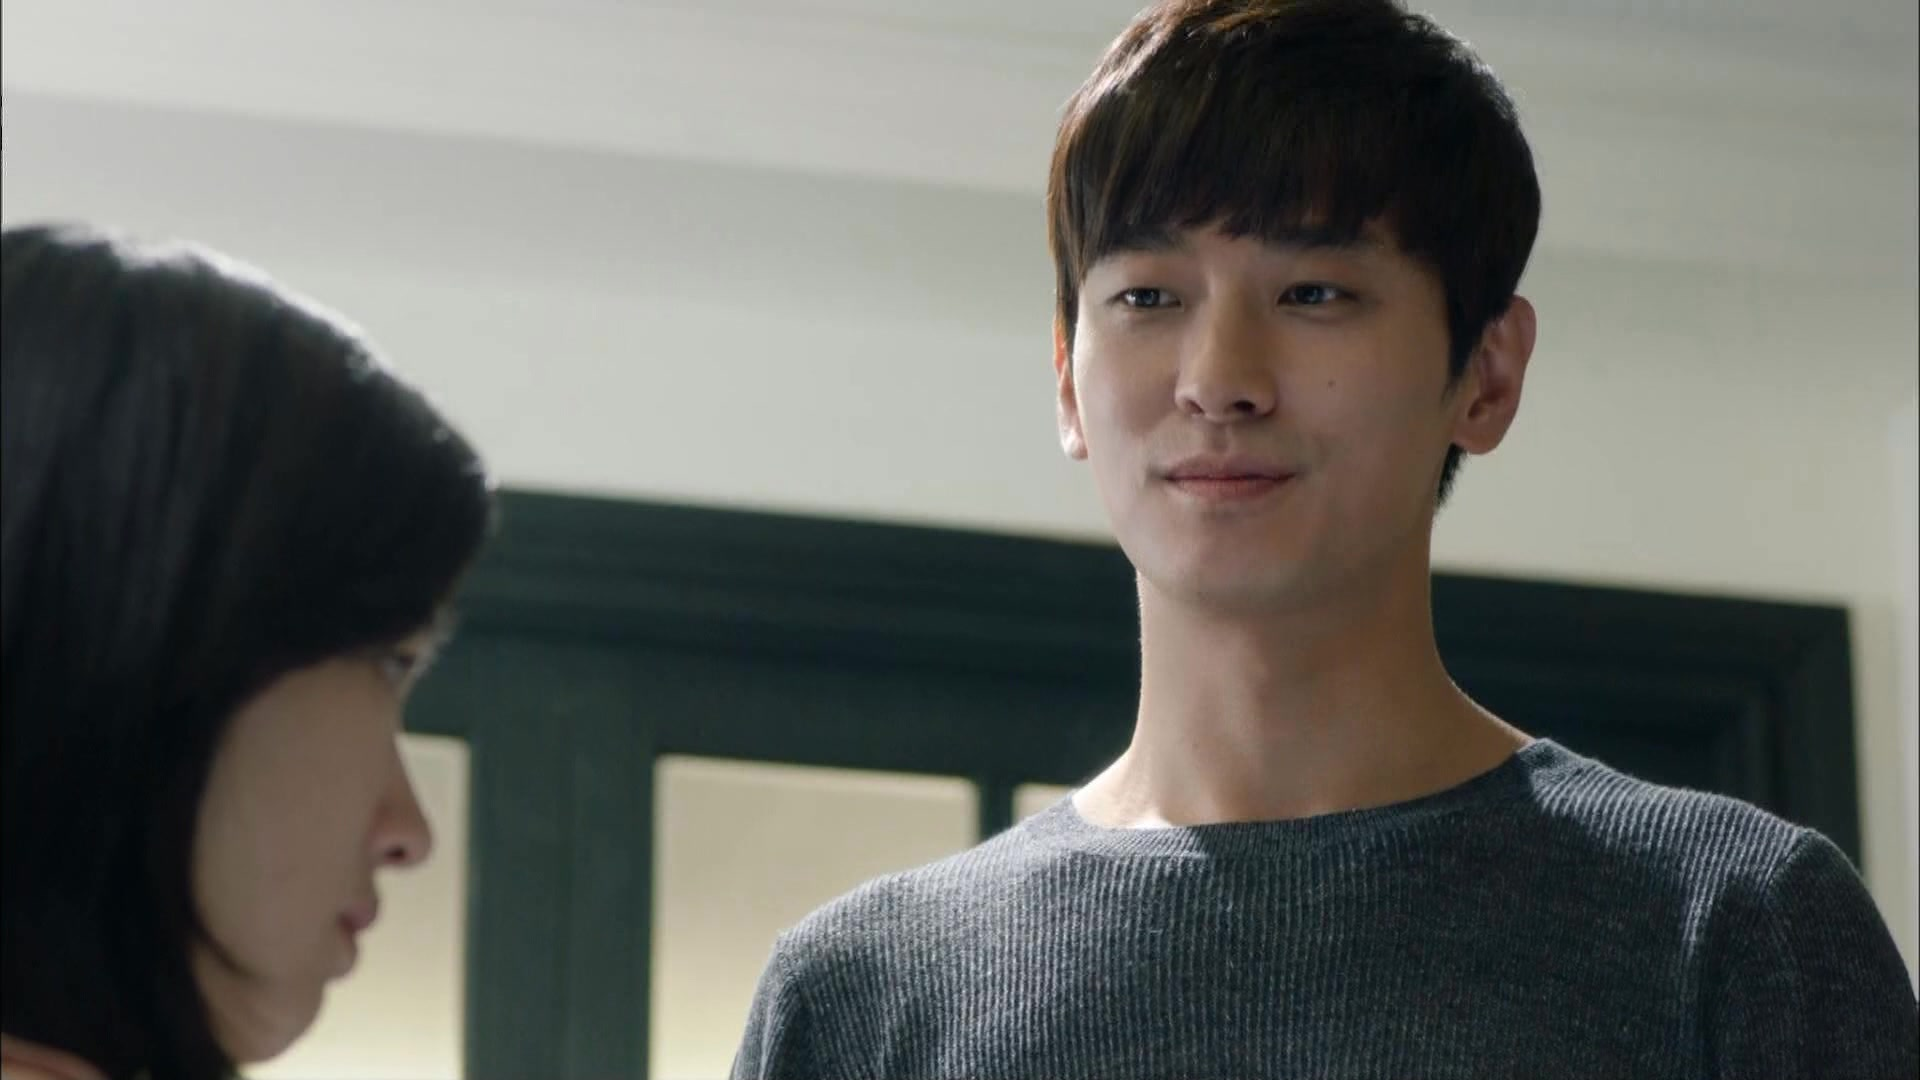 Mask episode 11 2015 - Mask Episode 7 Watch Full Episodes Free Korea Tv Shows Rakuten Viki